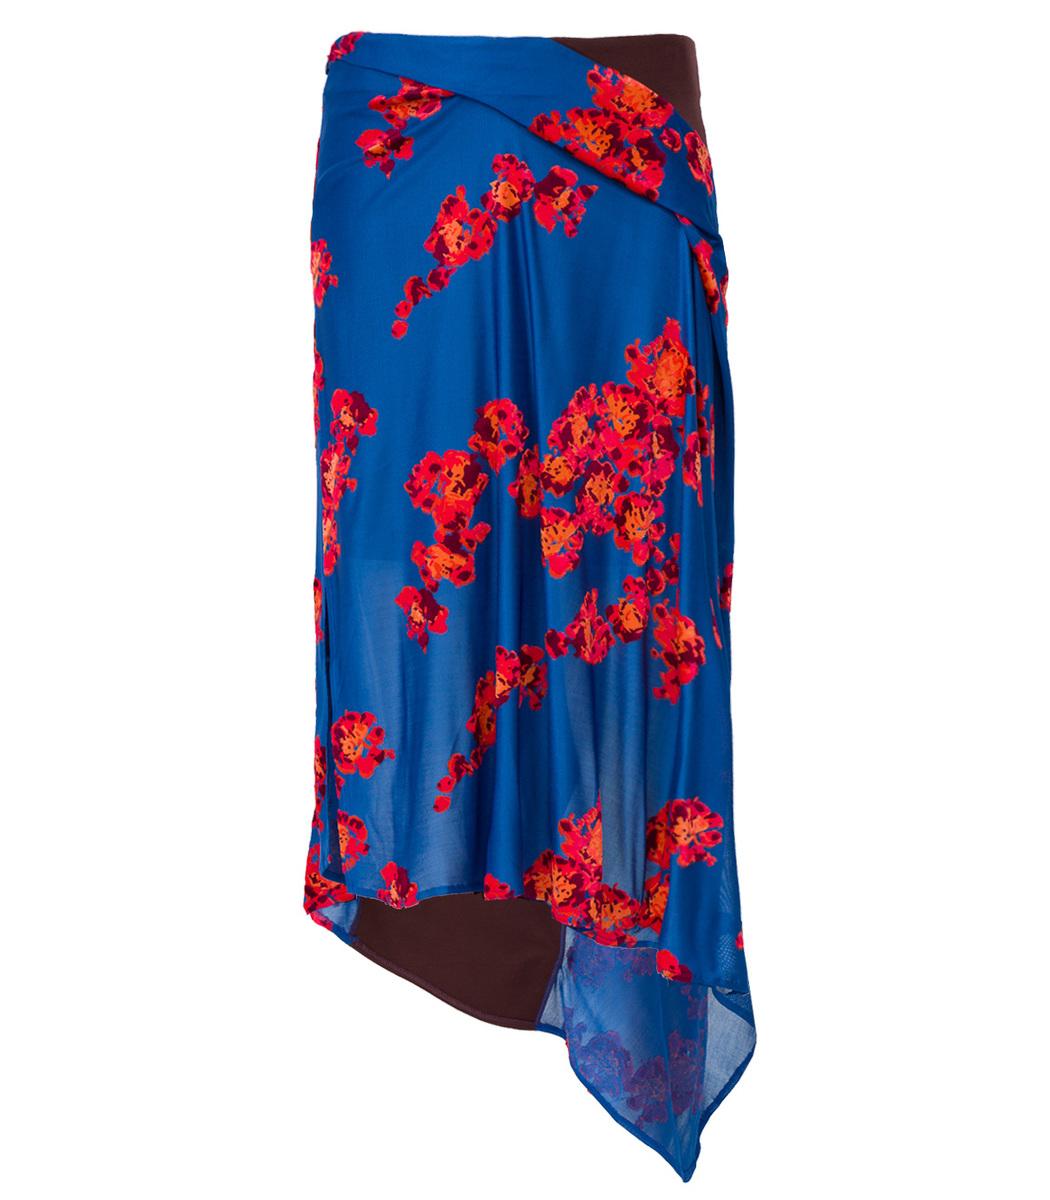 Atlein Blue Jacquard Jersey Asymmetrical Skirt